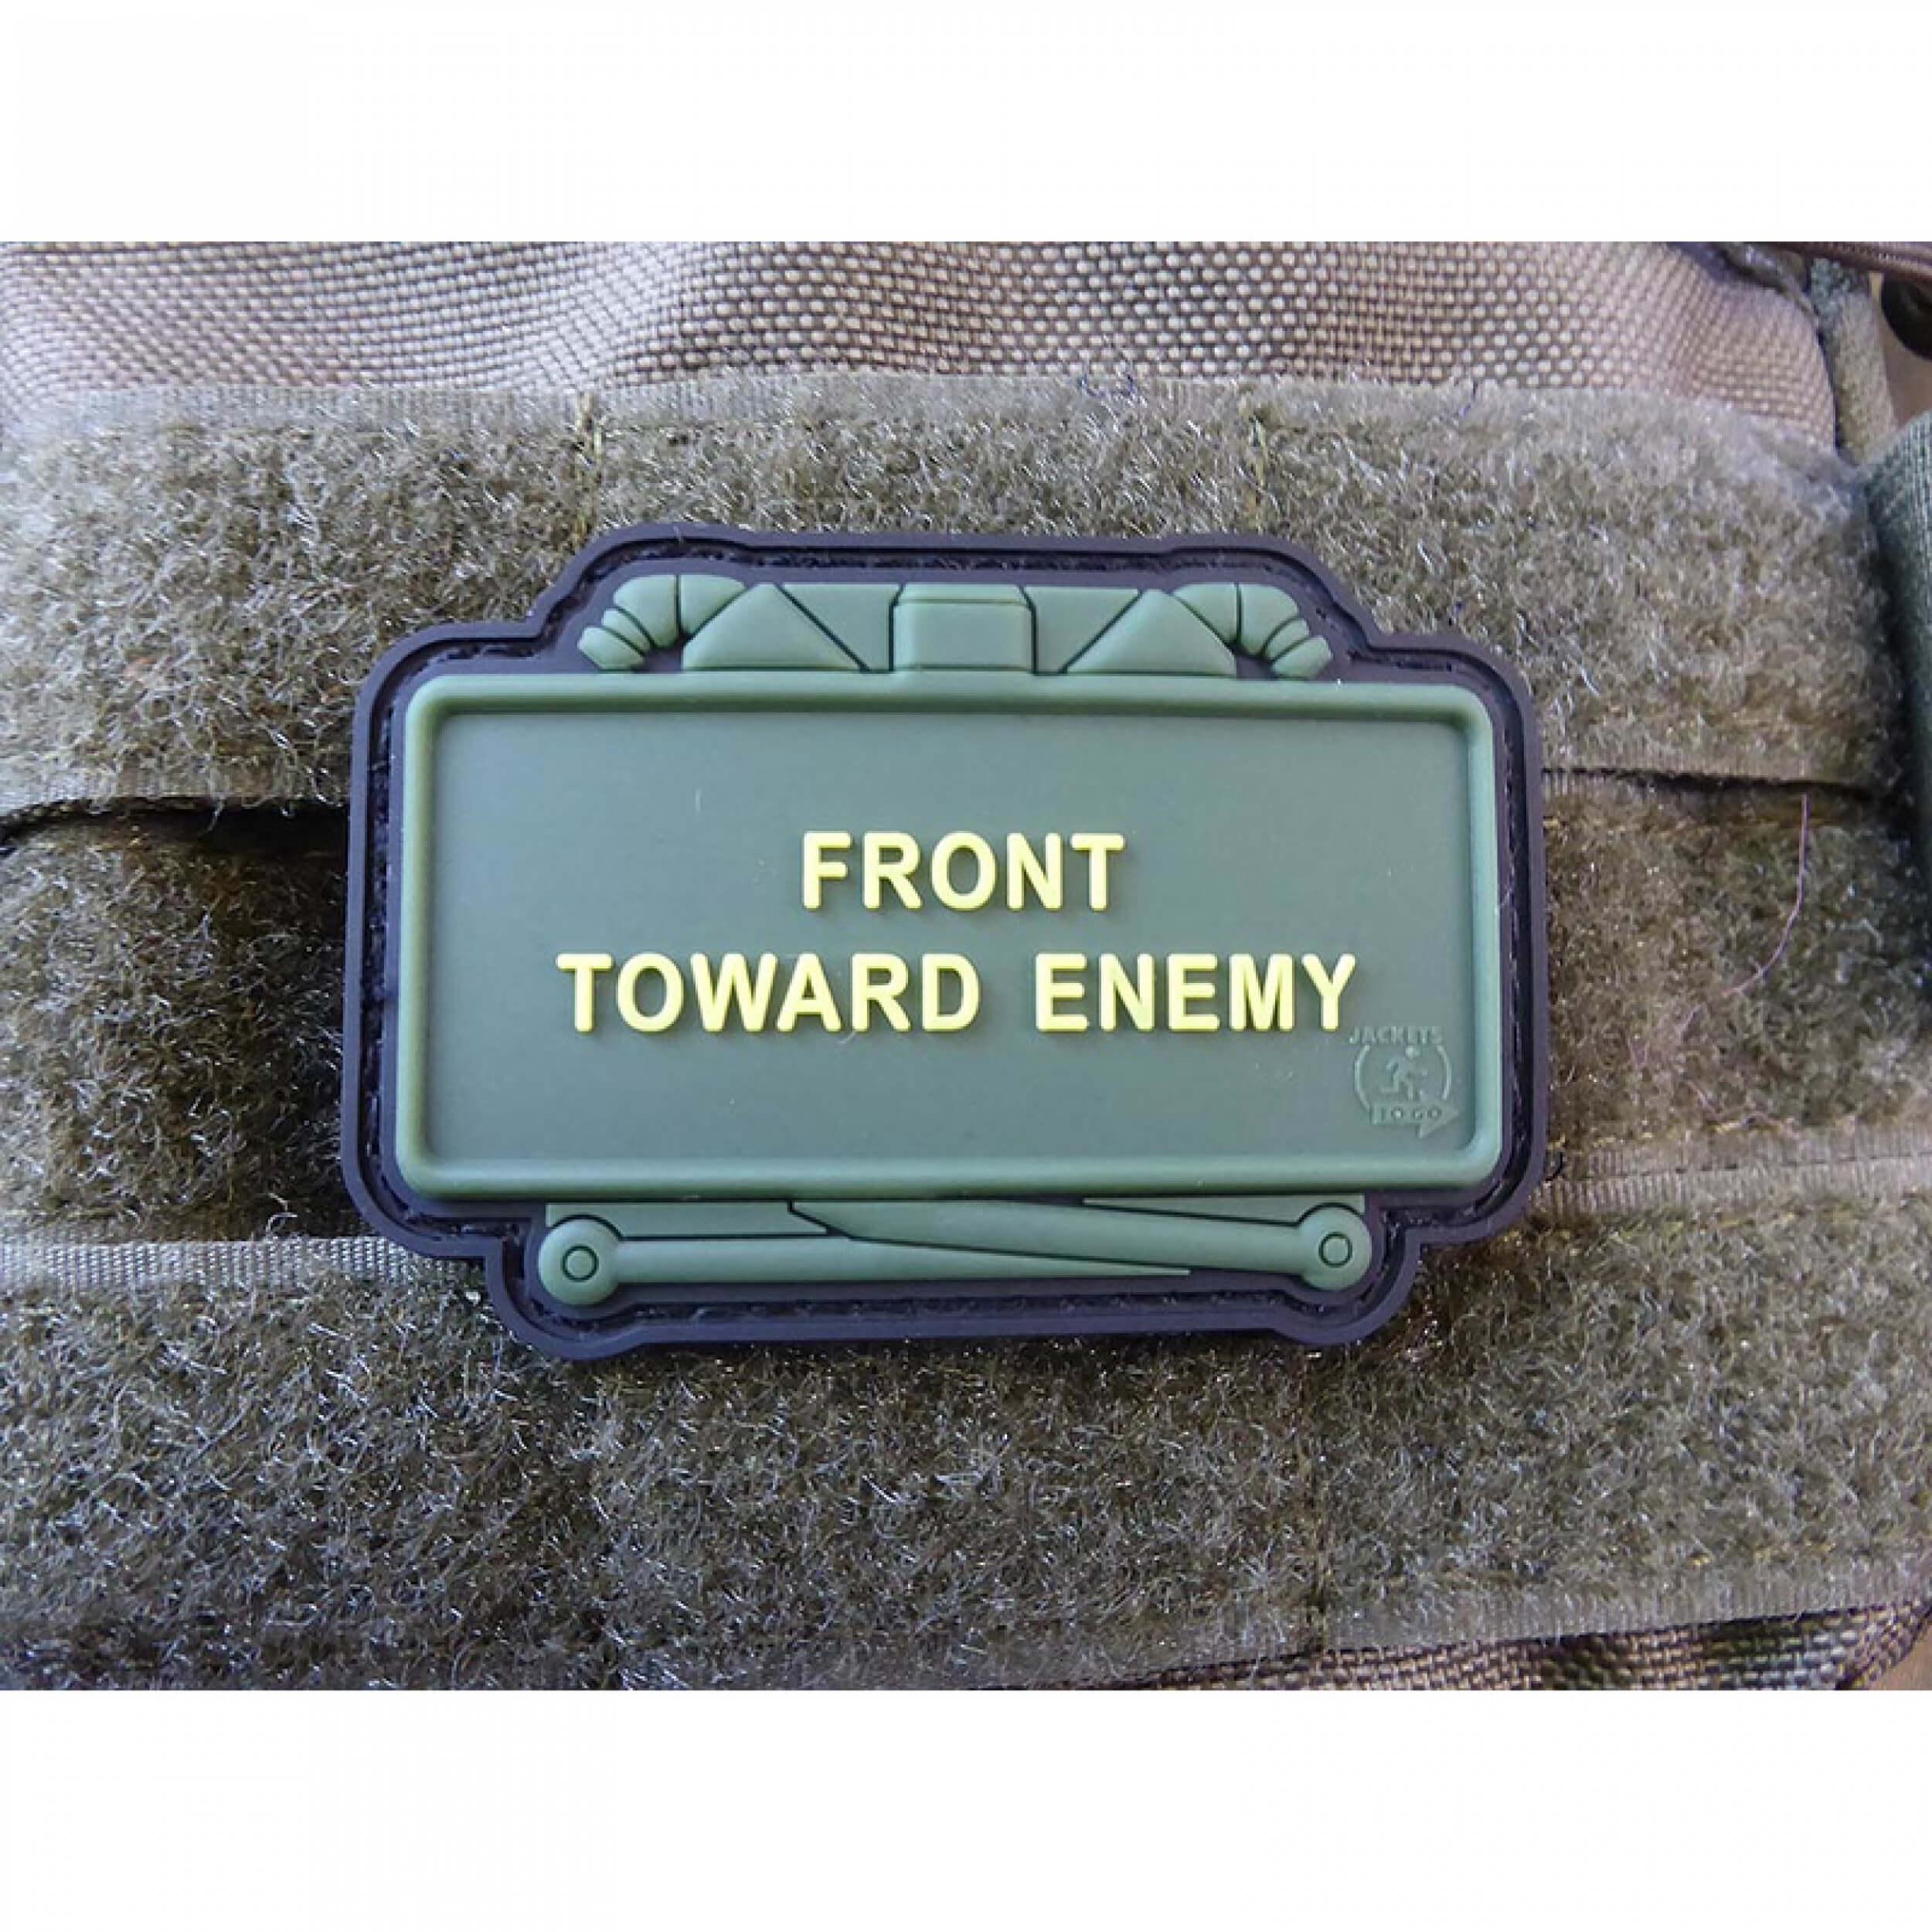 JTG CLAYMORE MINE Patch, Front Toward Enemy, fullcolor / JTG 3D Rubber Patch